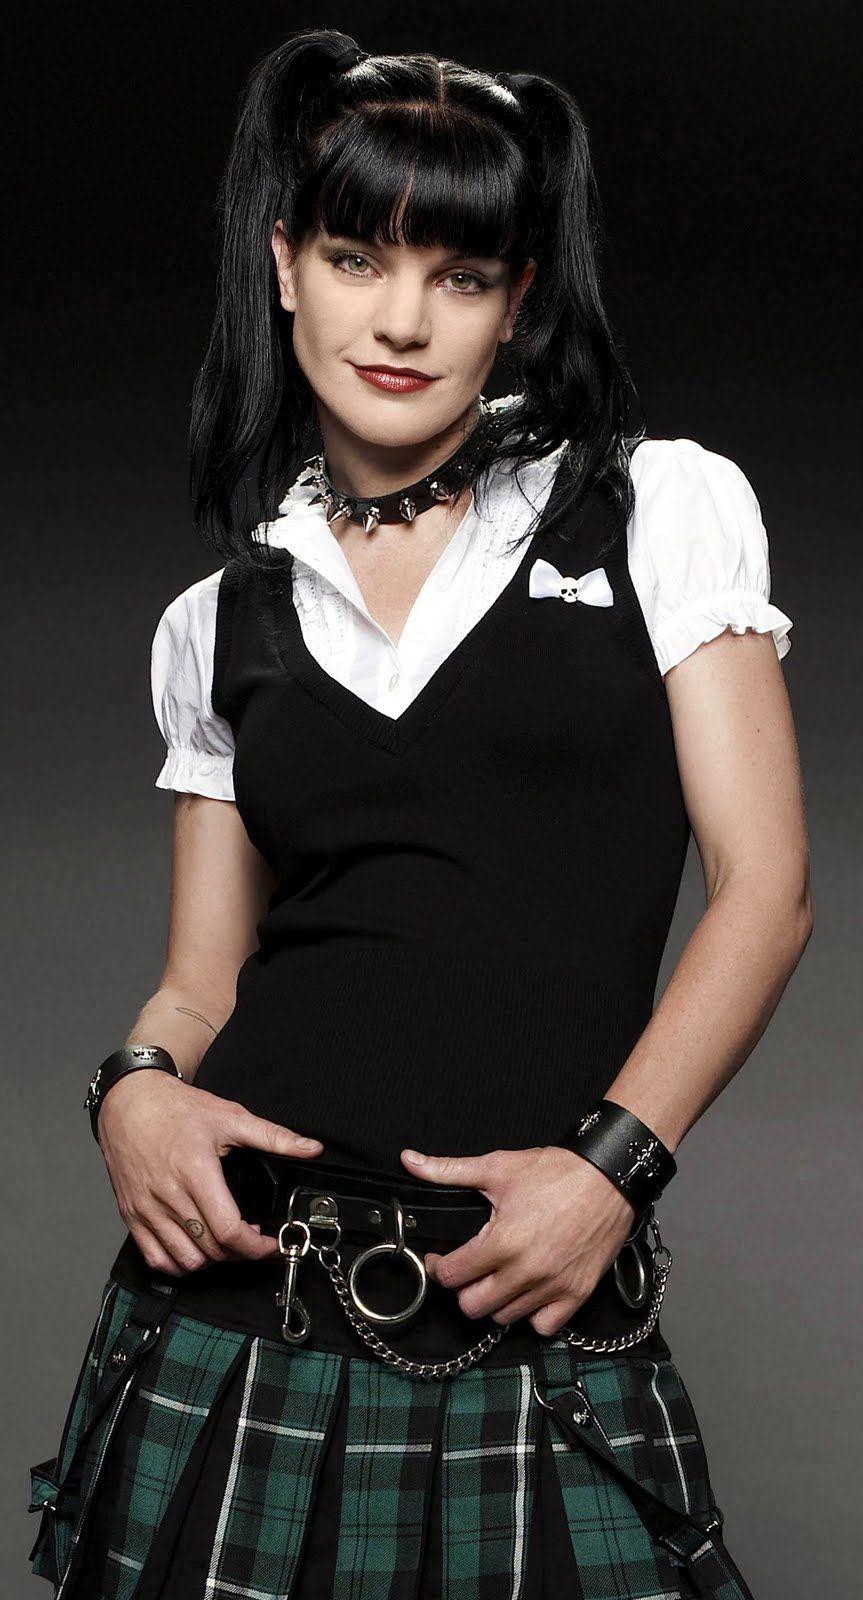 Abby Sciuto